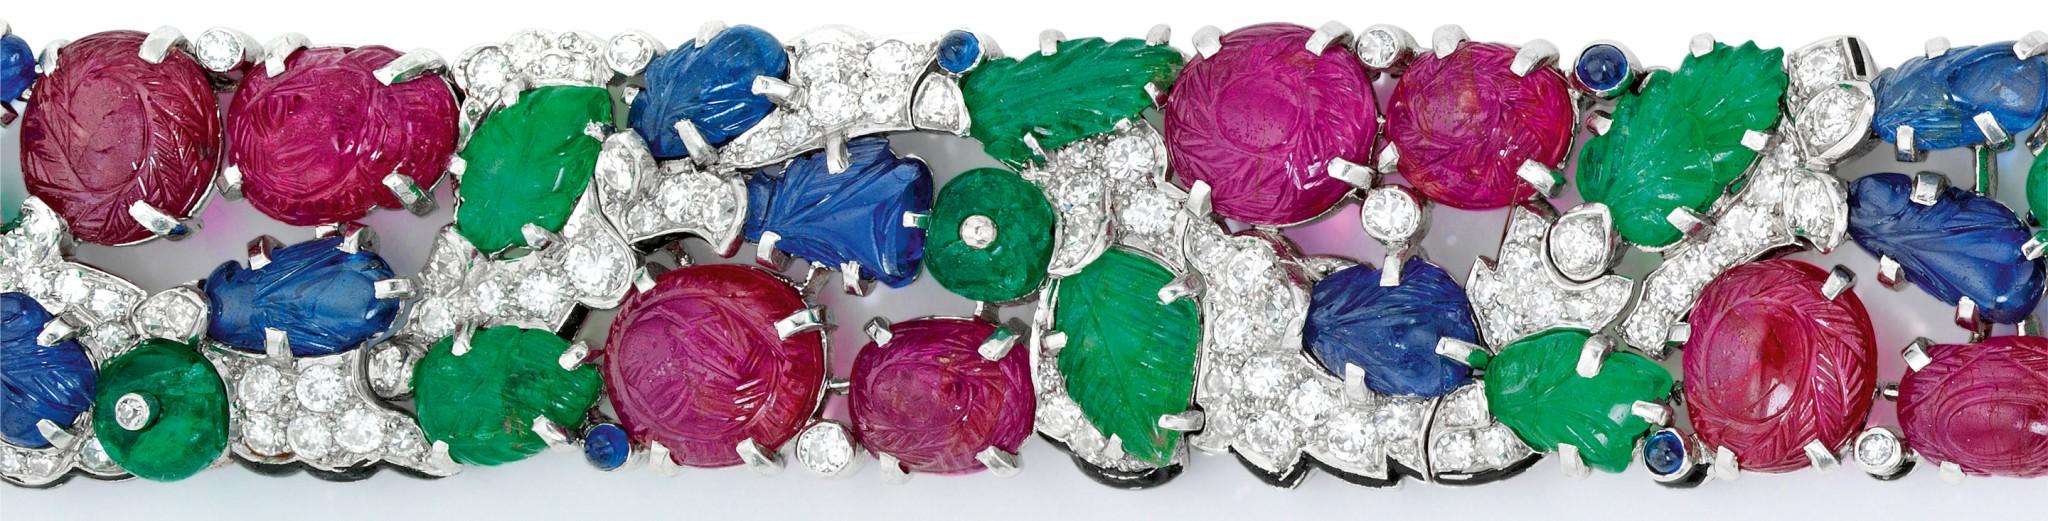 Art Deco Cartier Bracelet Sells For $1.34 Million At Sotheby's